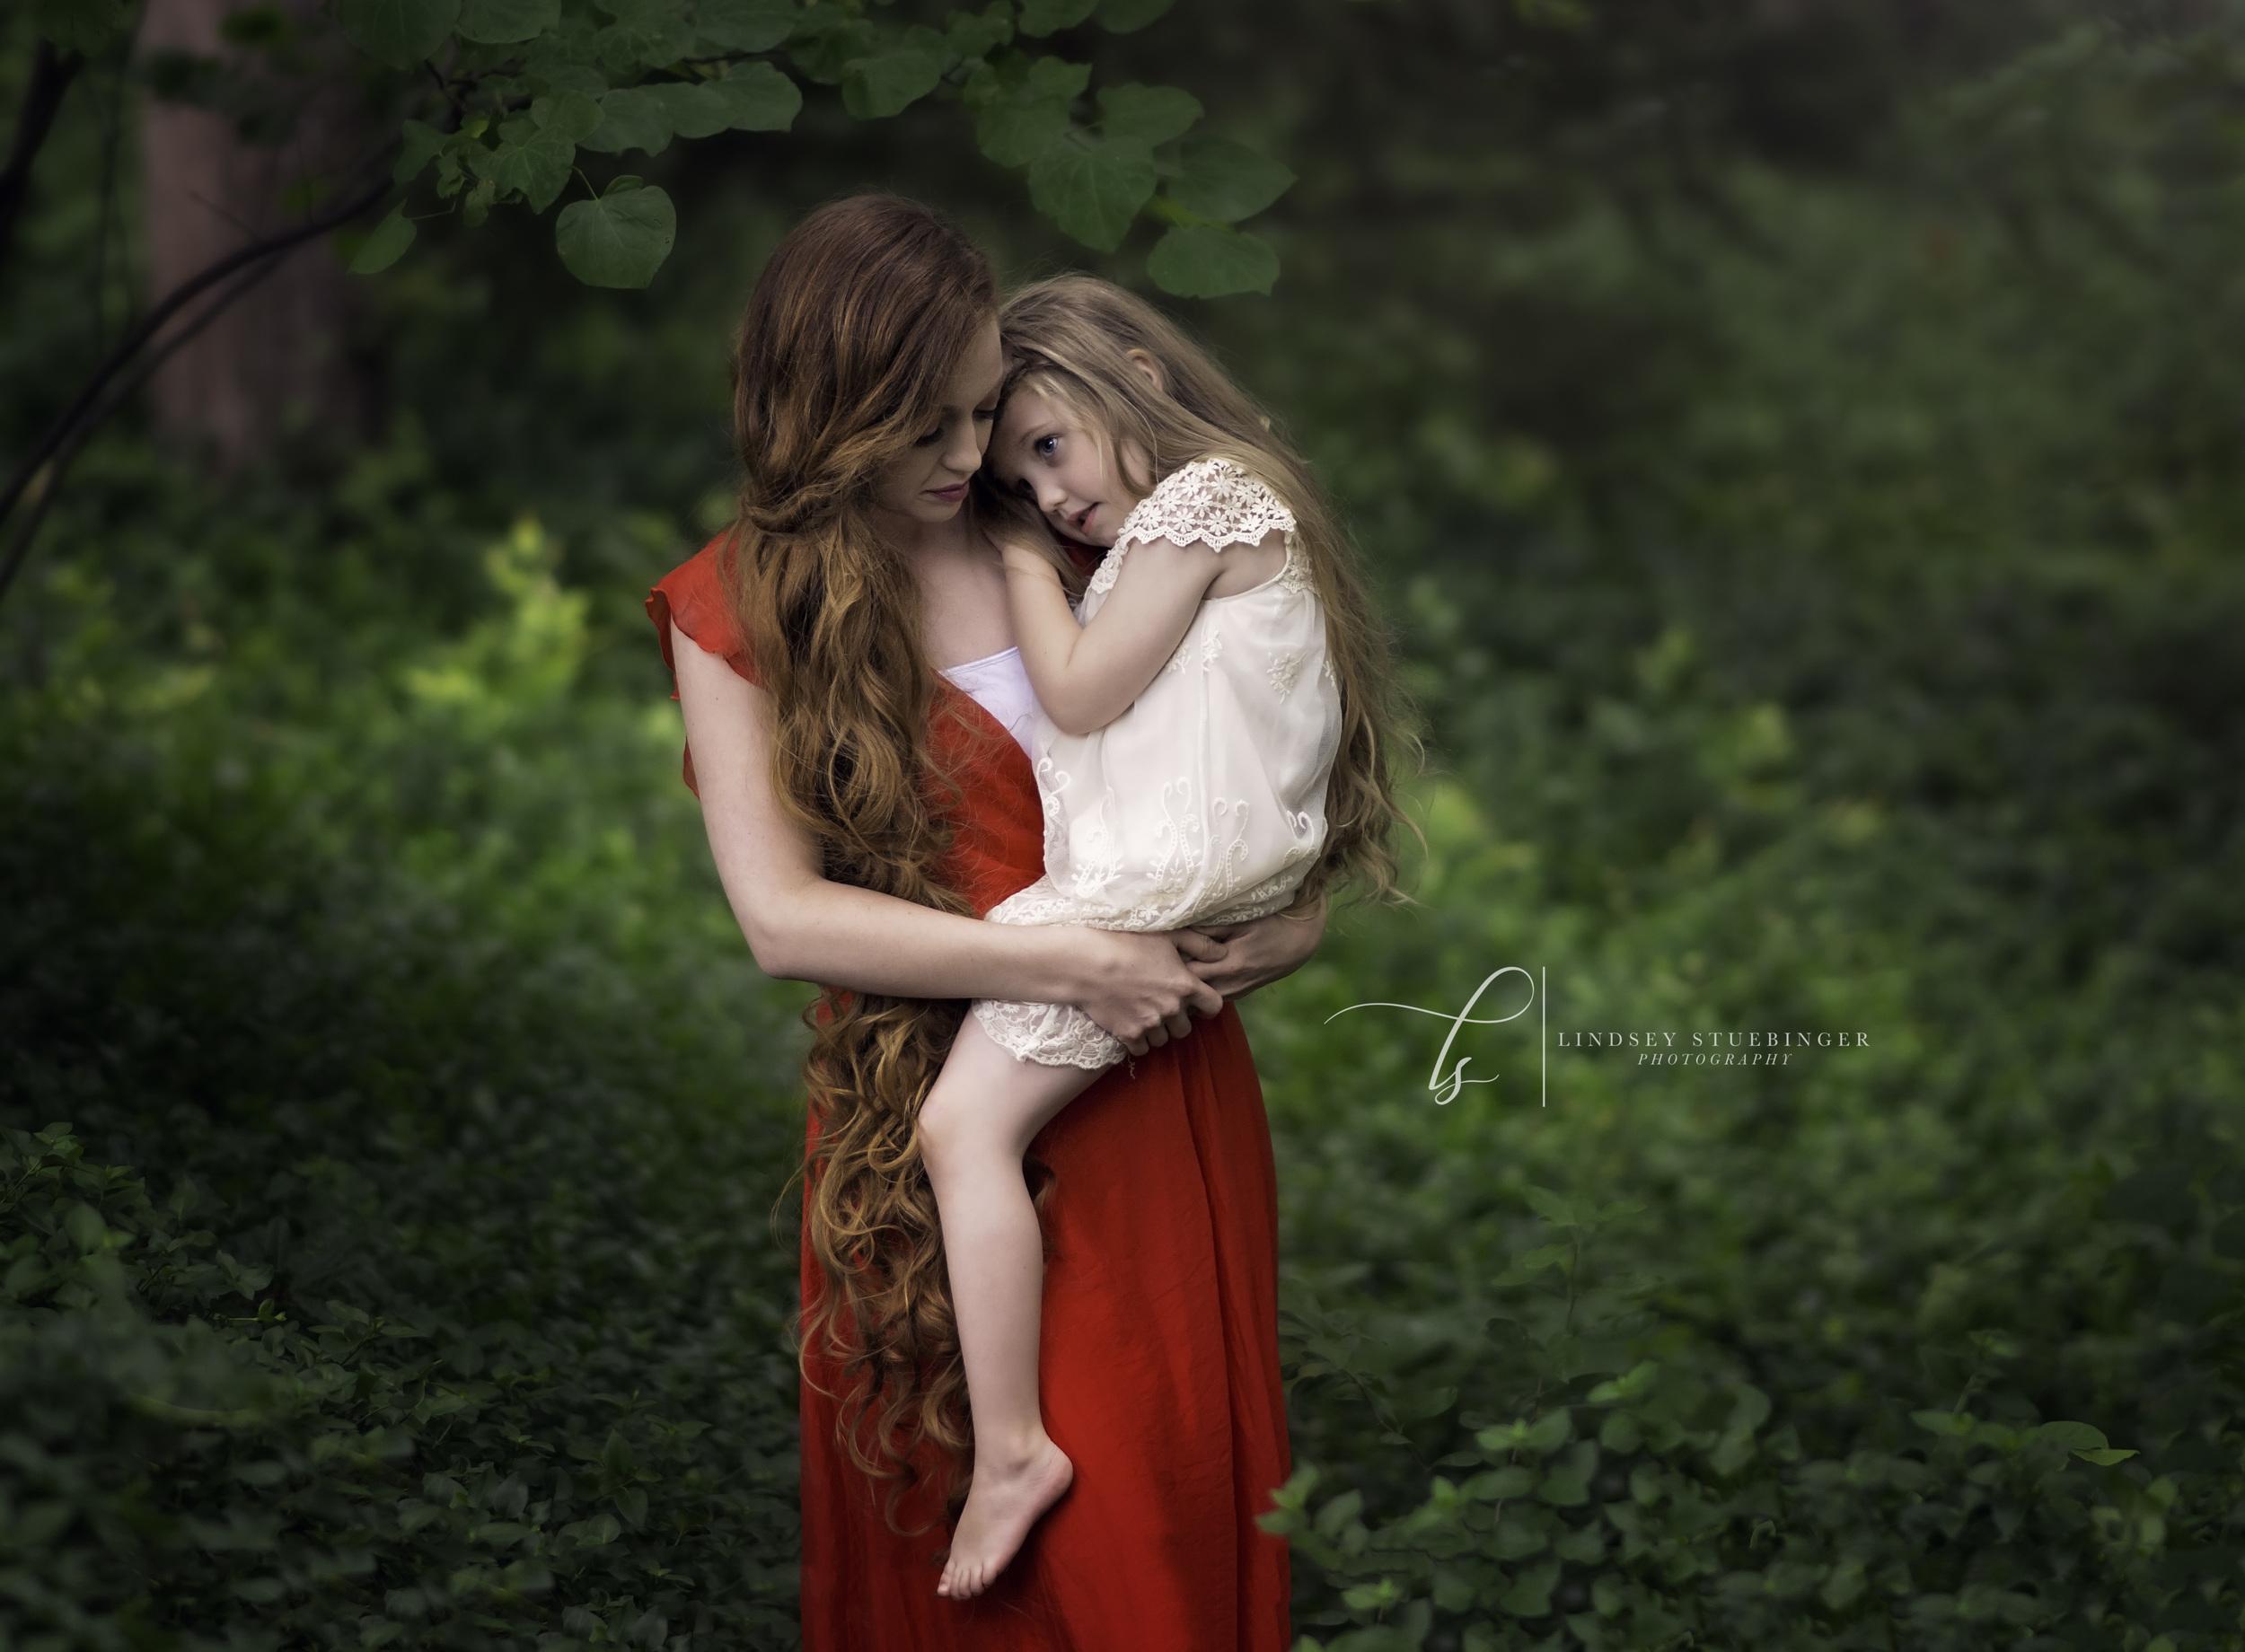 Models: Megan Loftin and London Loftin